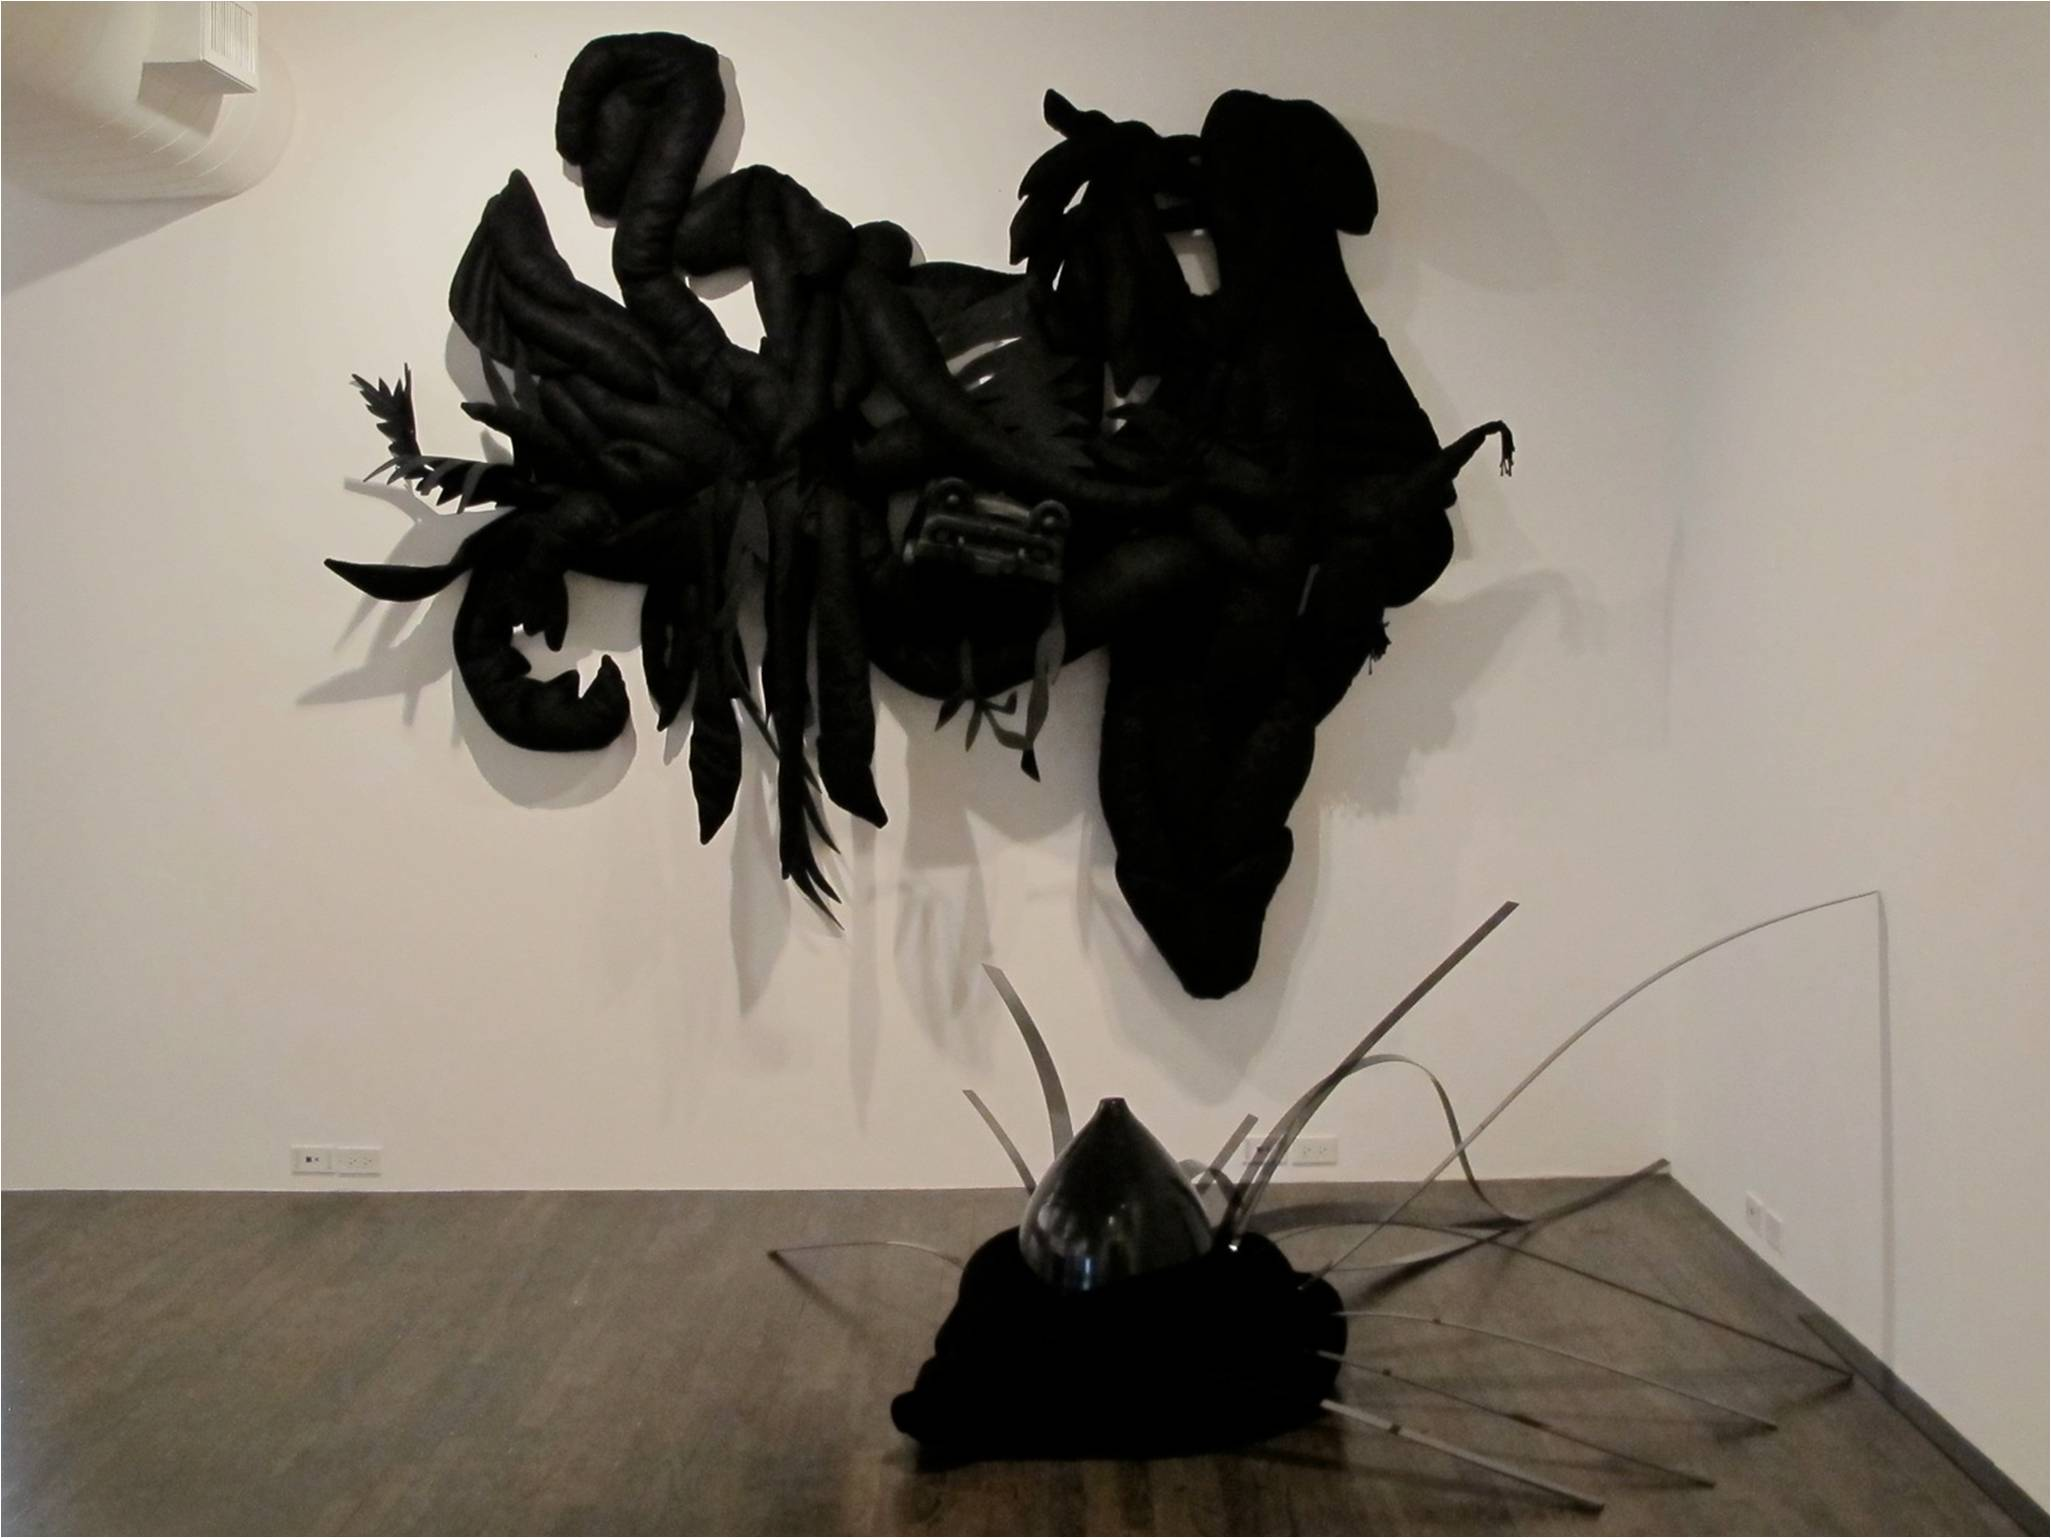 Ceibba negra, 2009